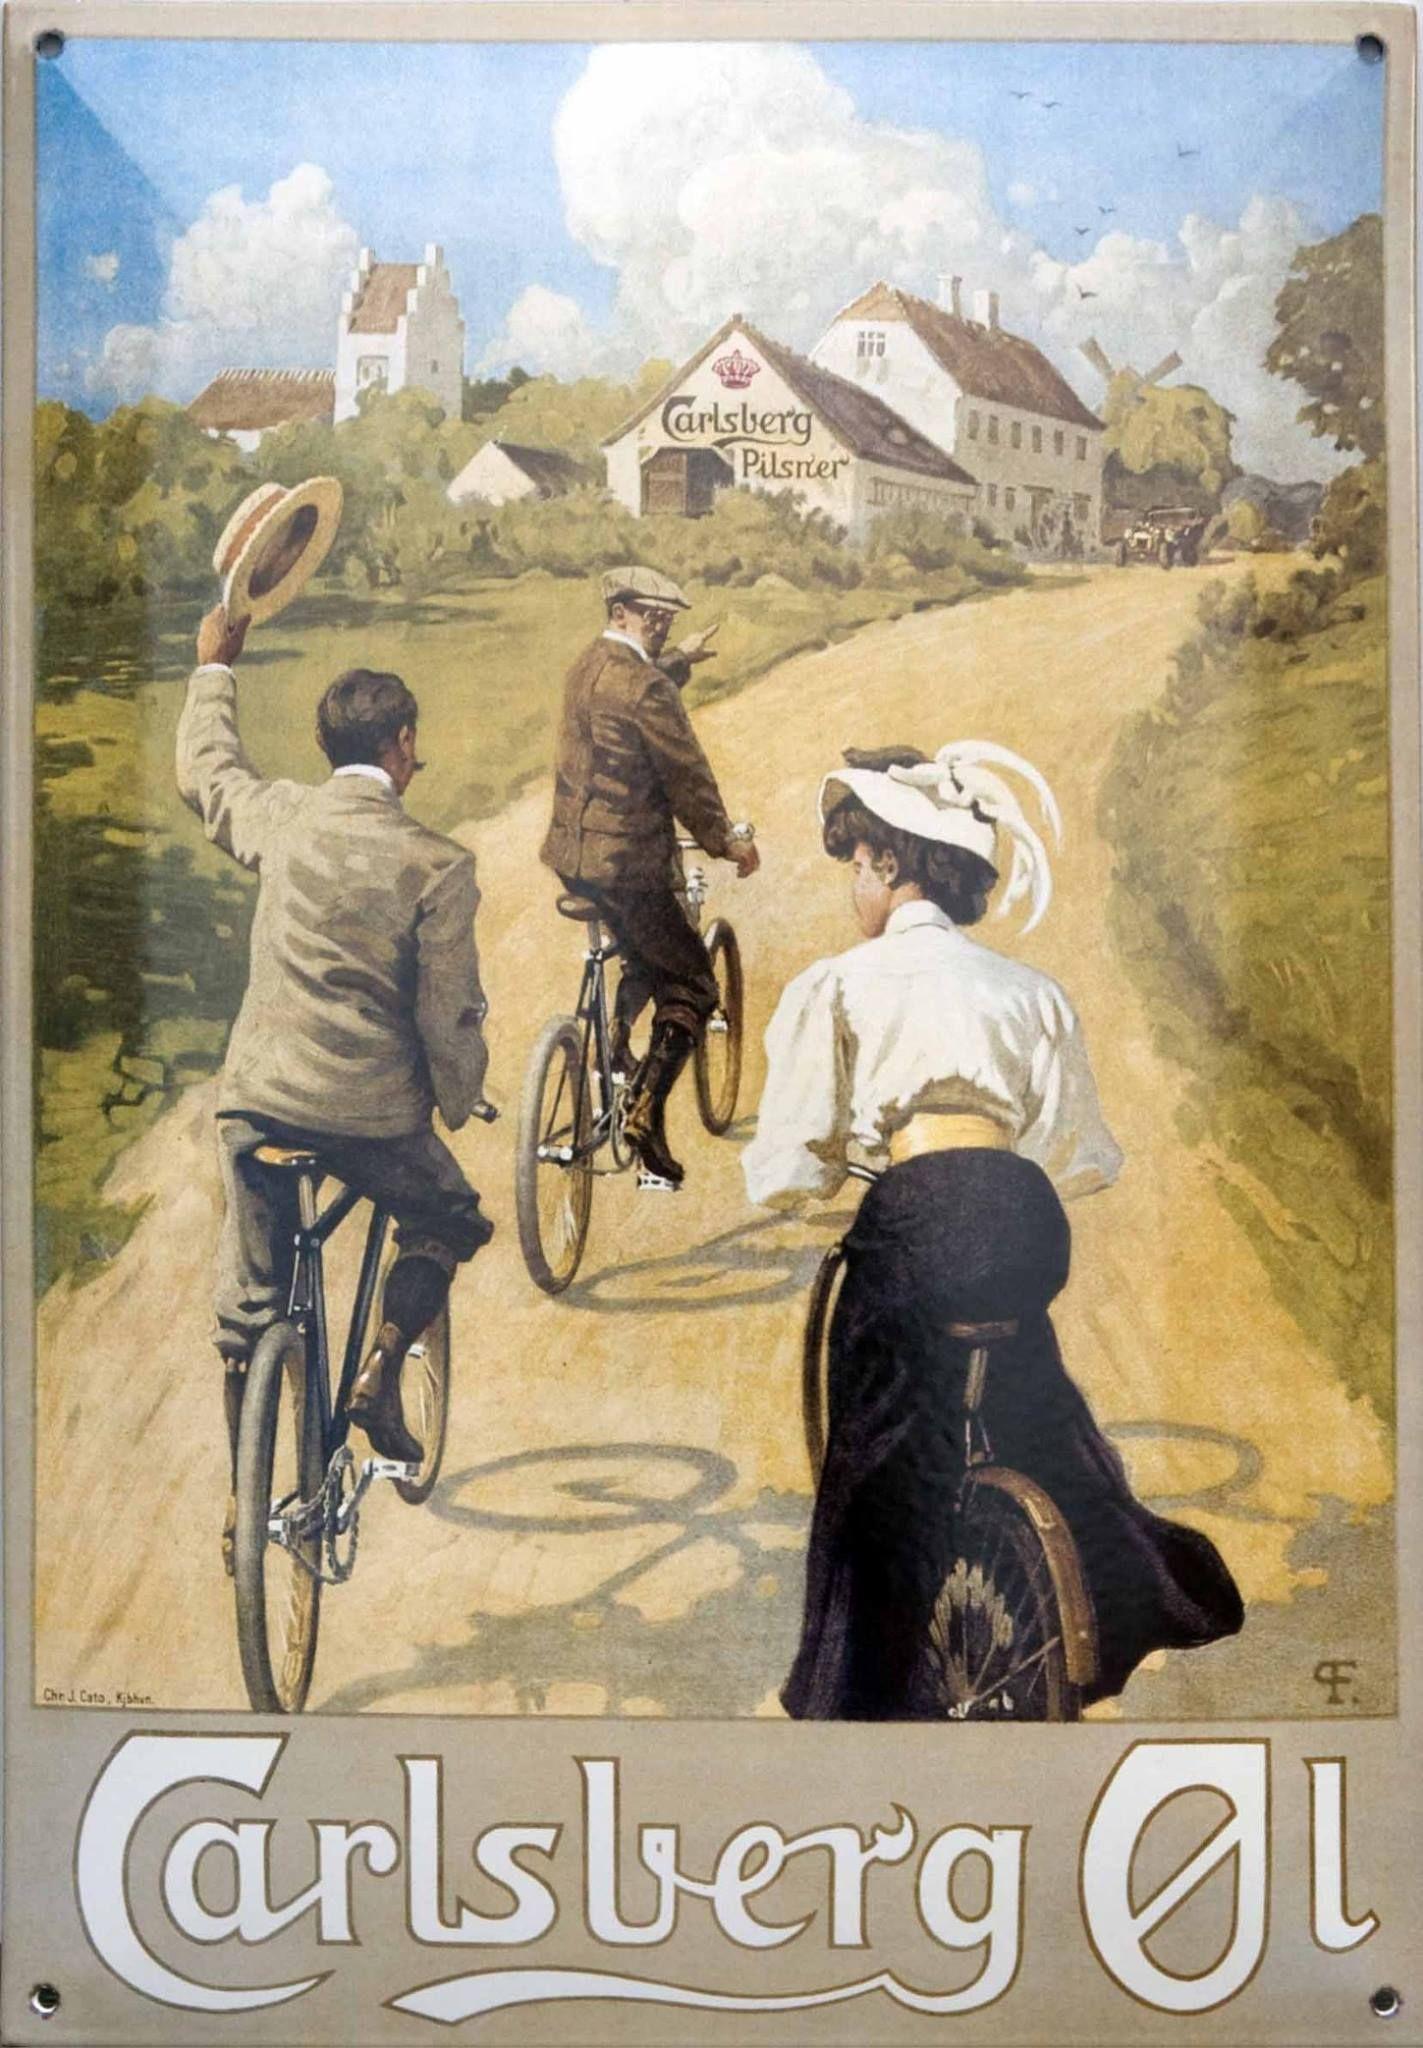 Pin Af Malle Keerd Pa Paul Fischer Poster Ideer Vintage Plakater Illustration